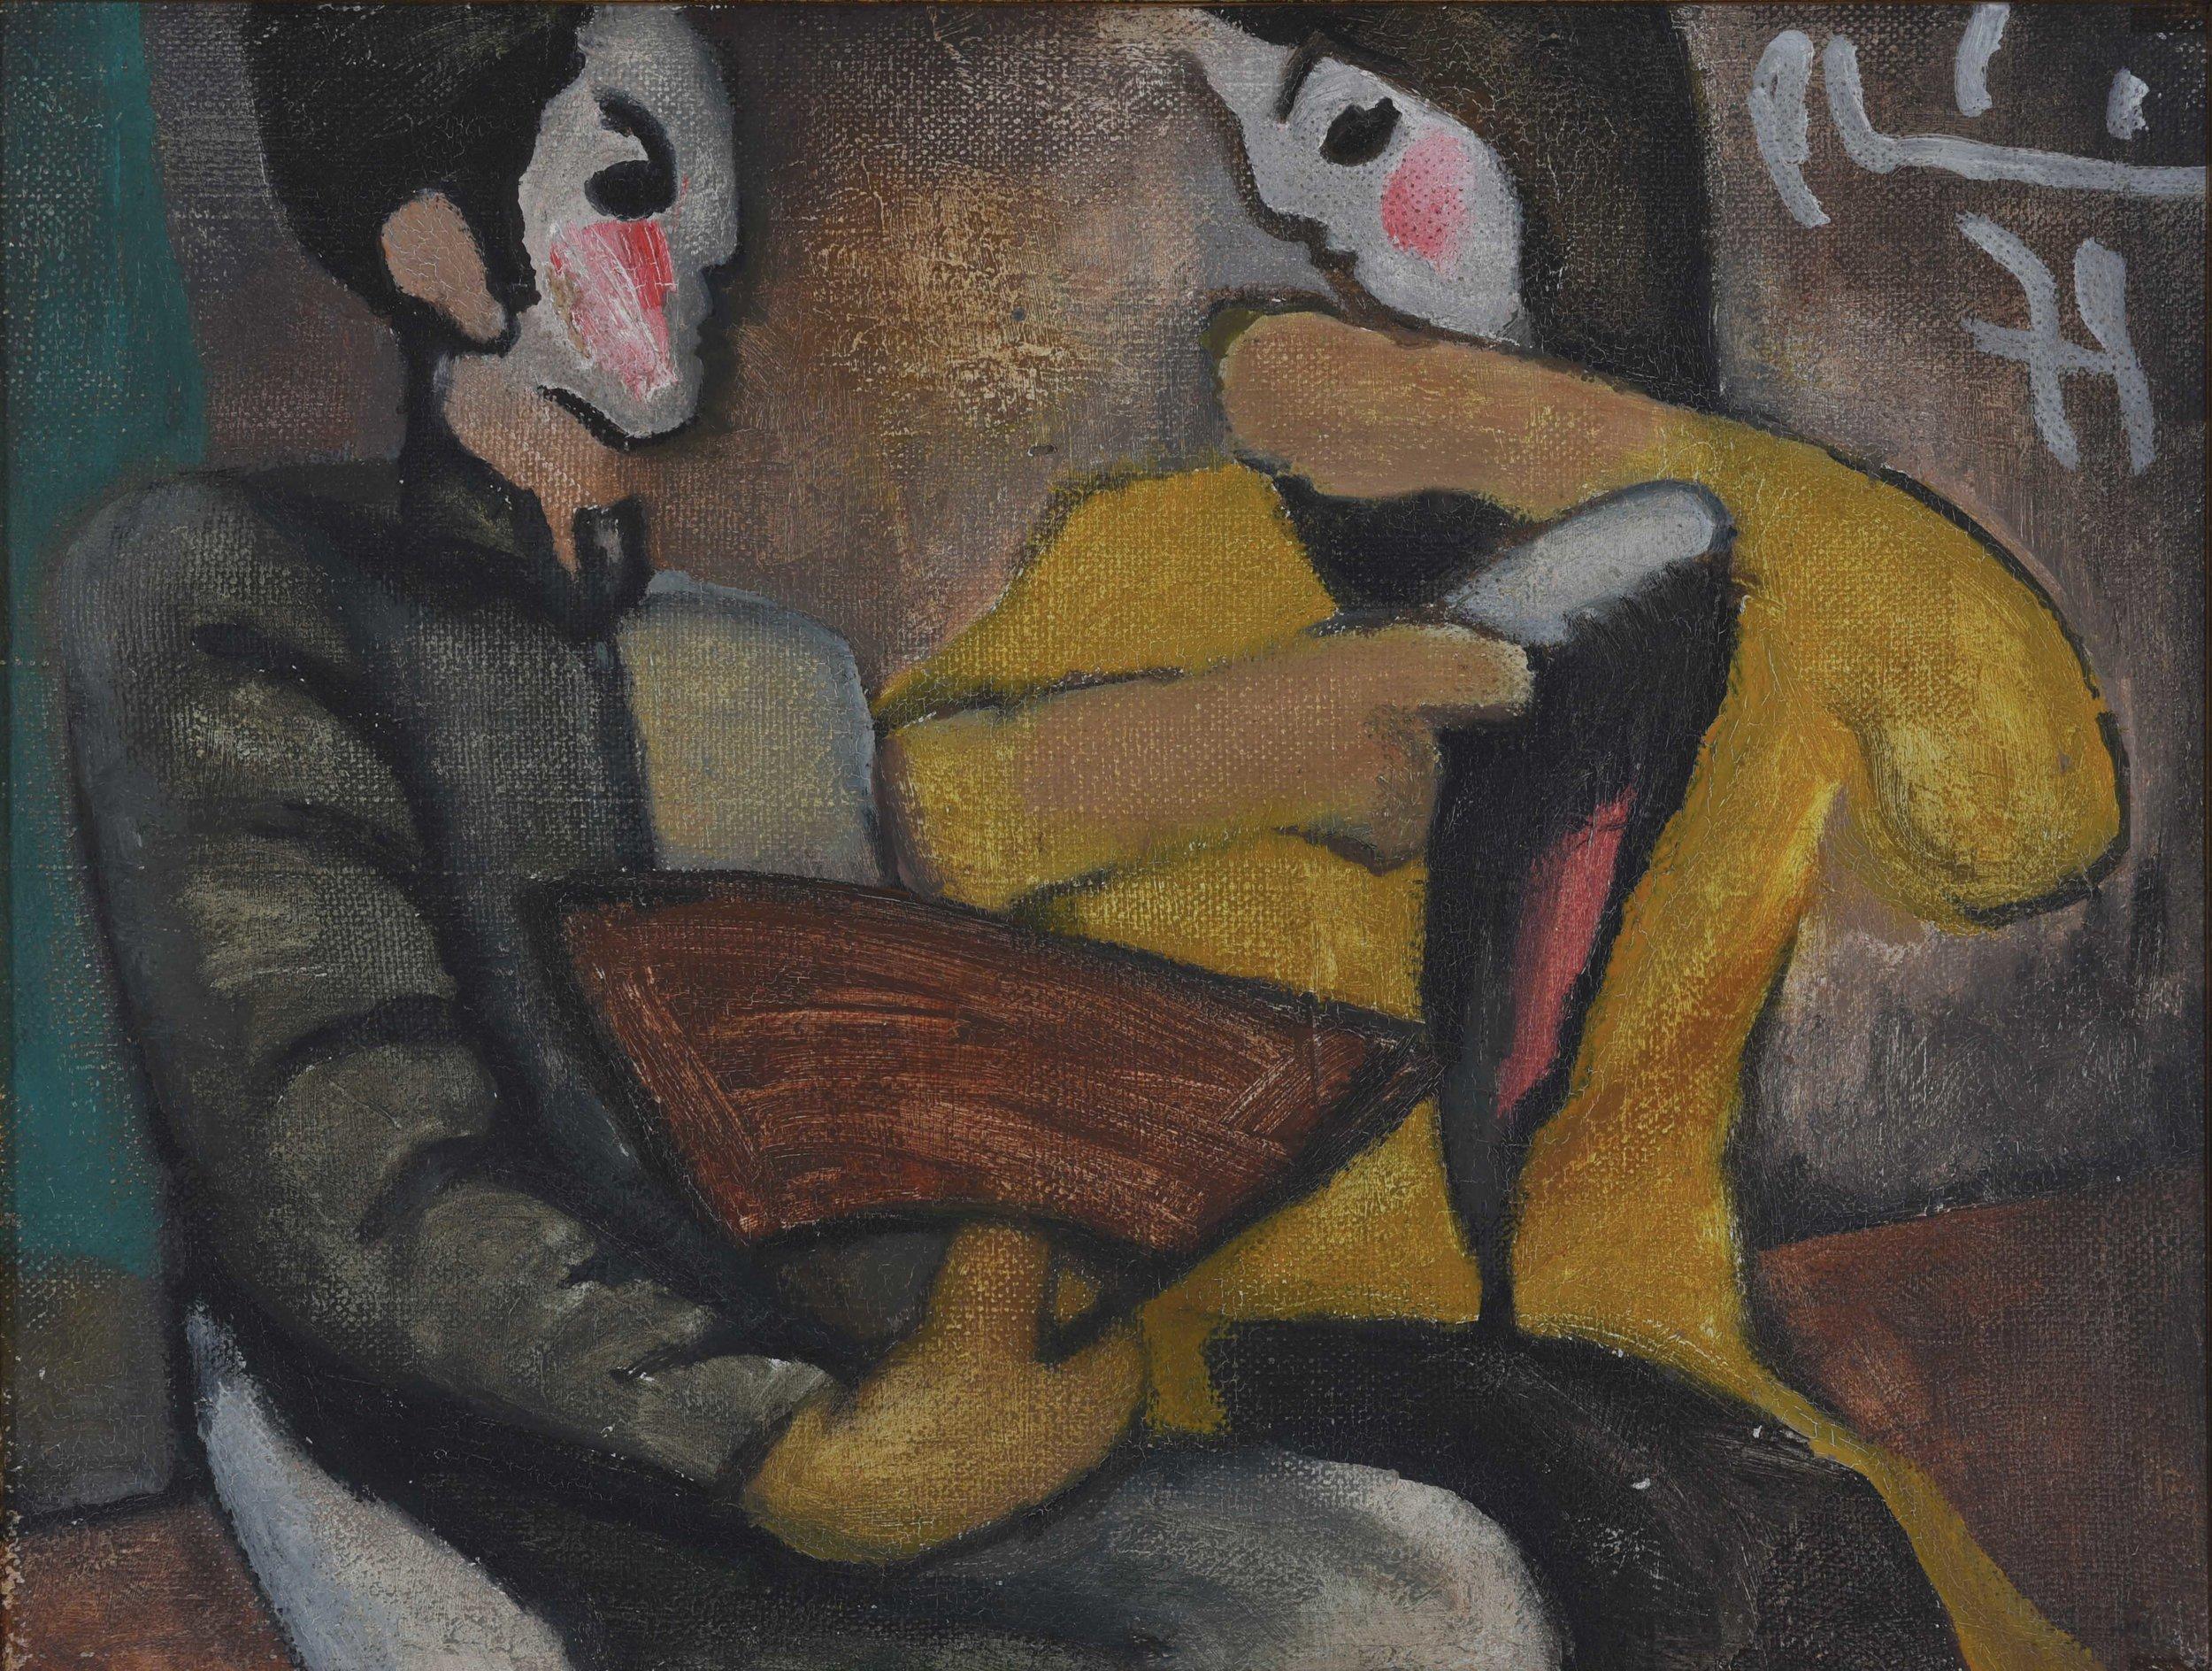 Bui Xuan Phai, Opera Players, 1979